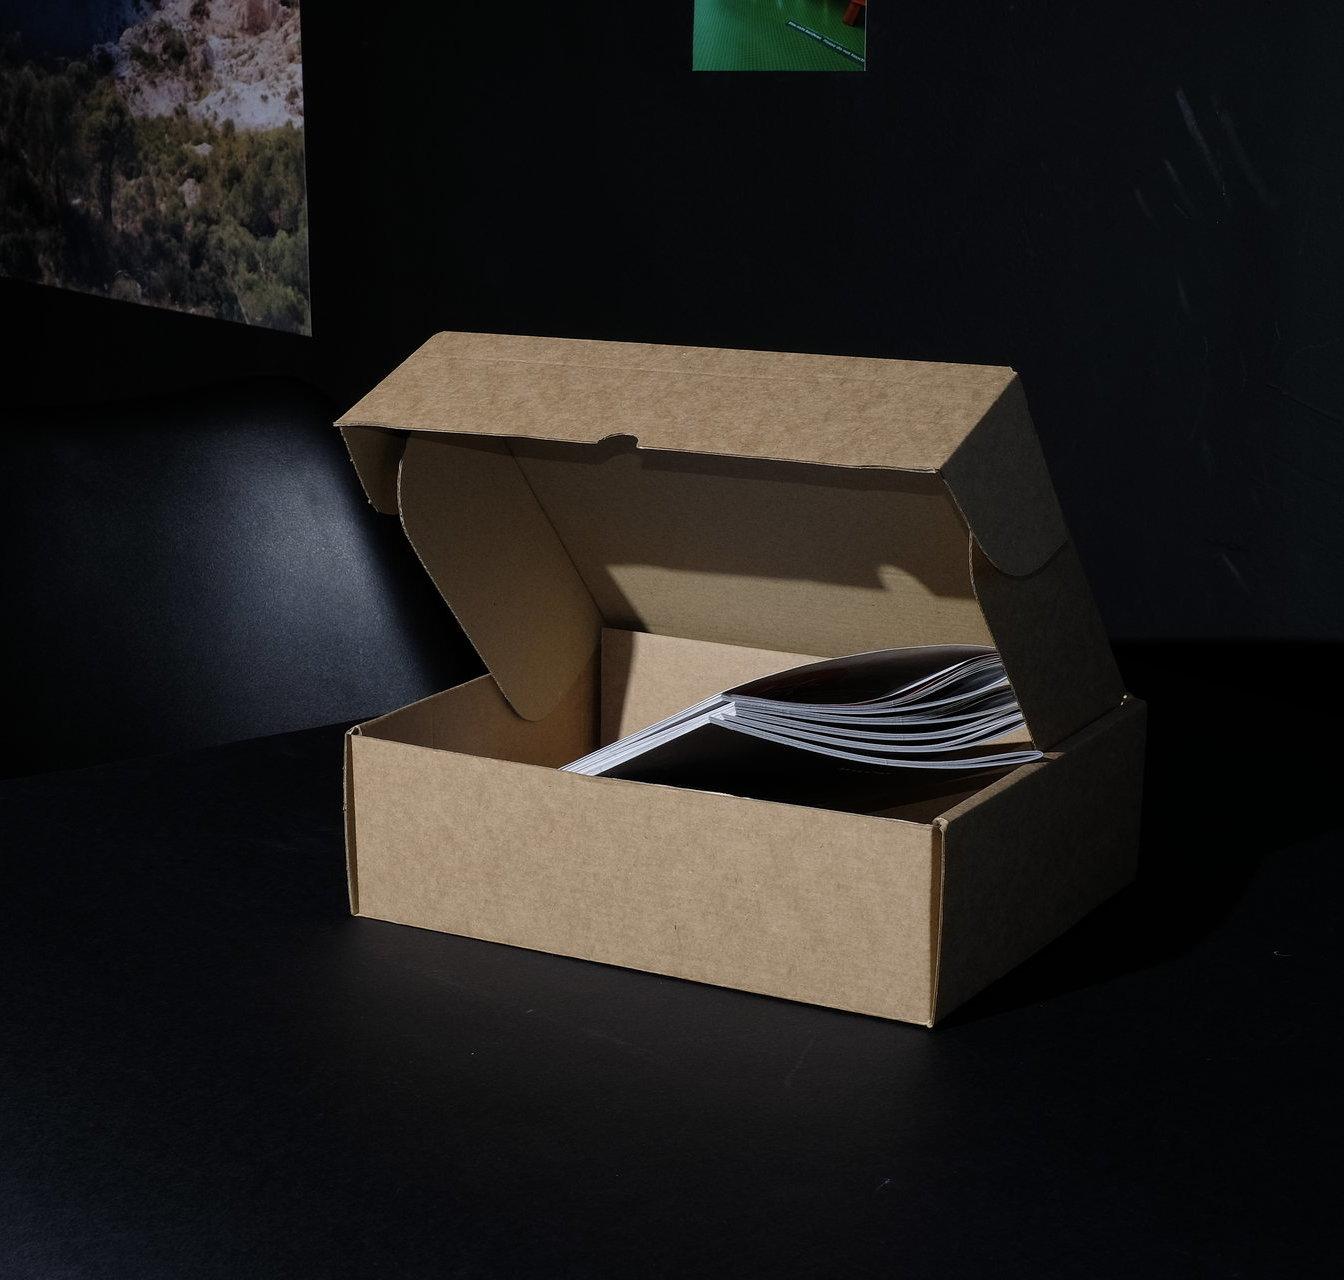 Кутия 230/180/70 мм